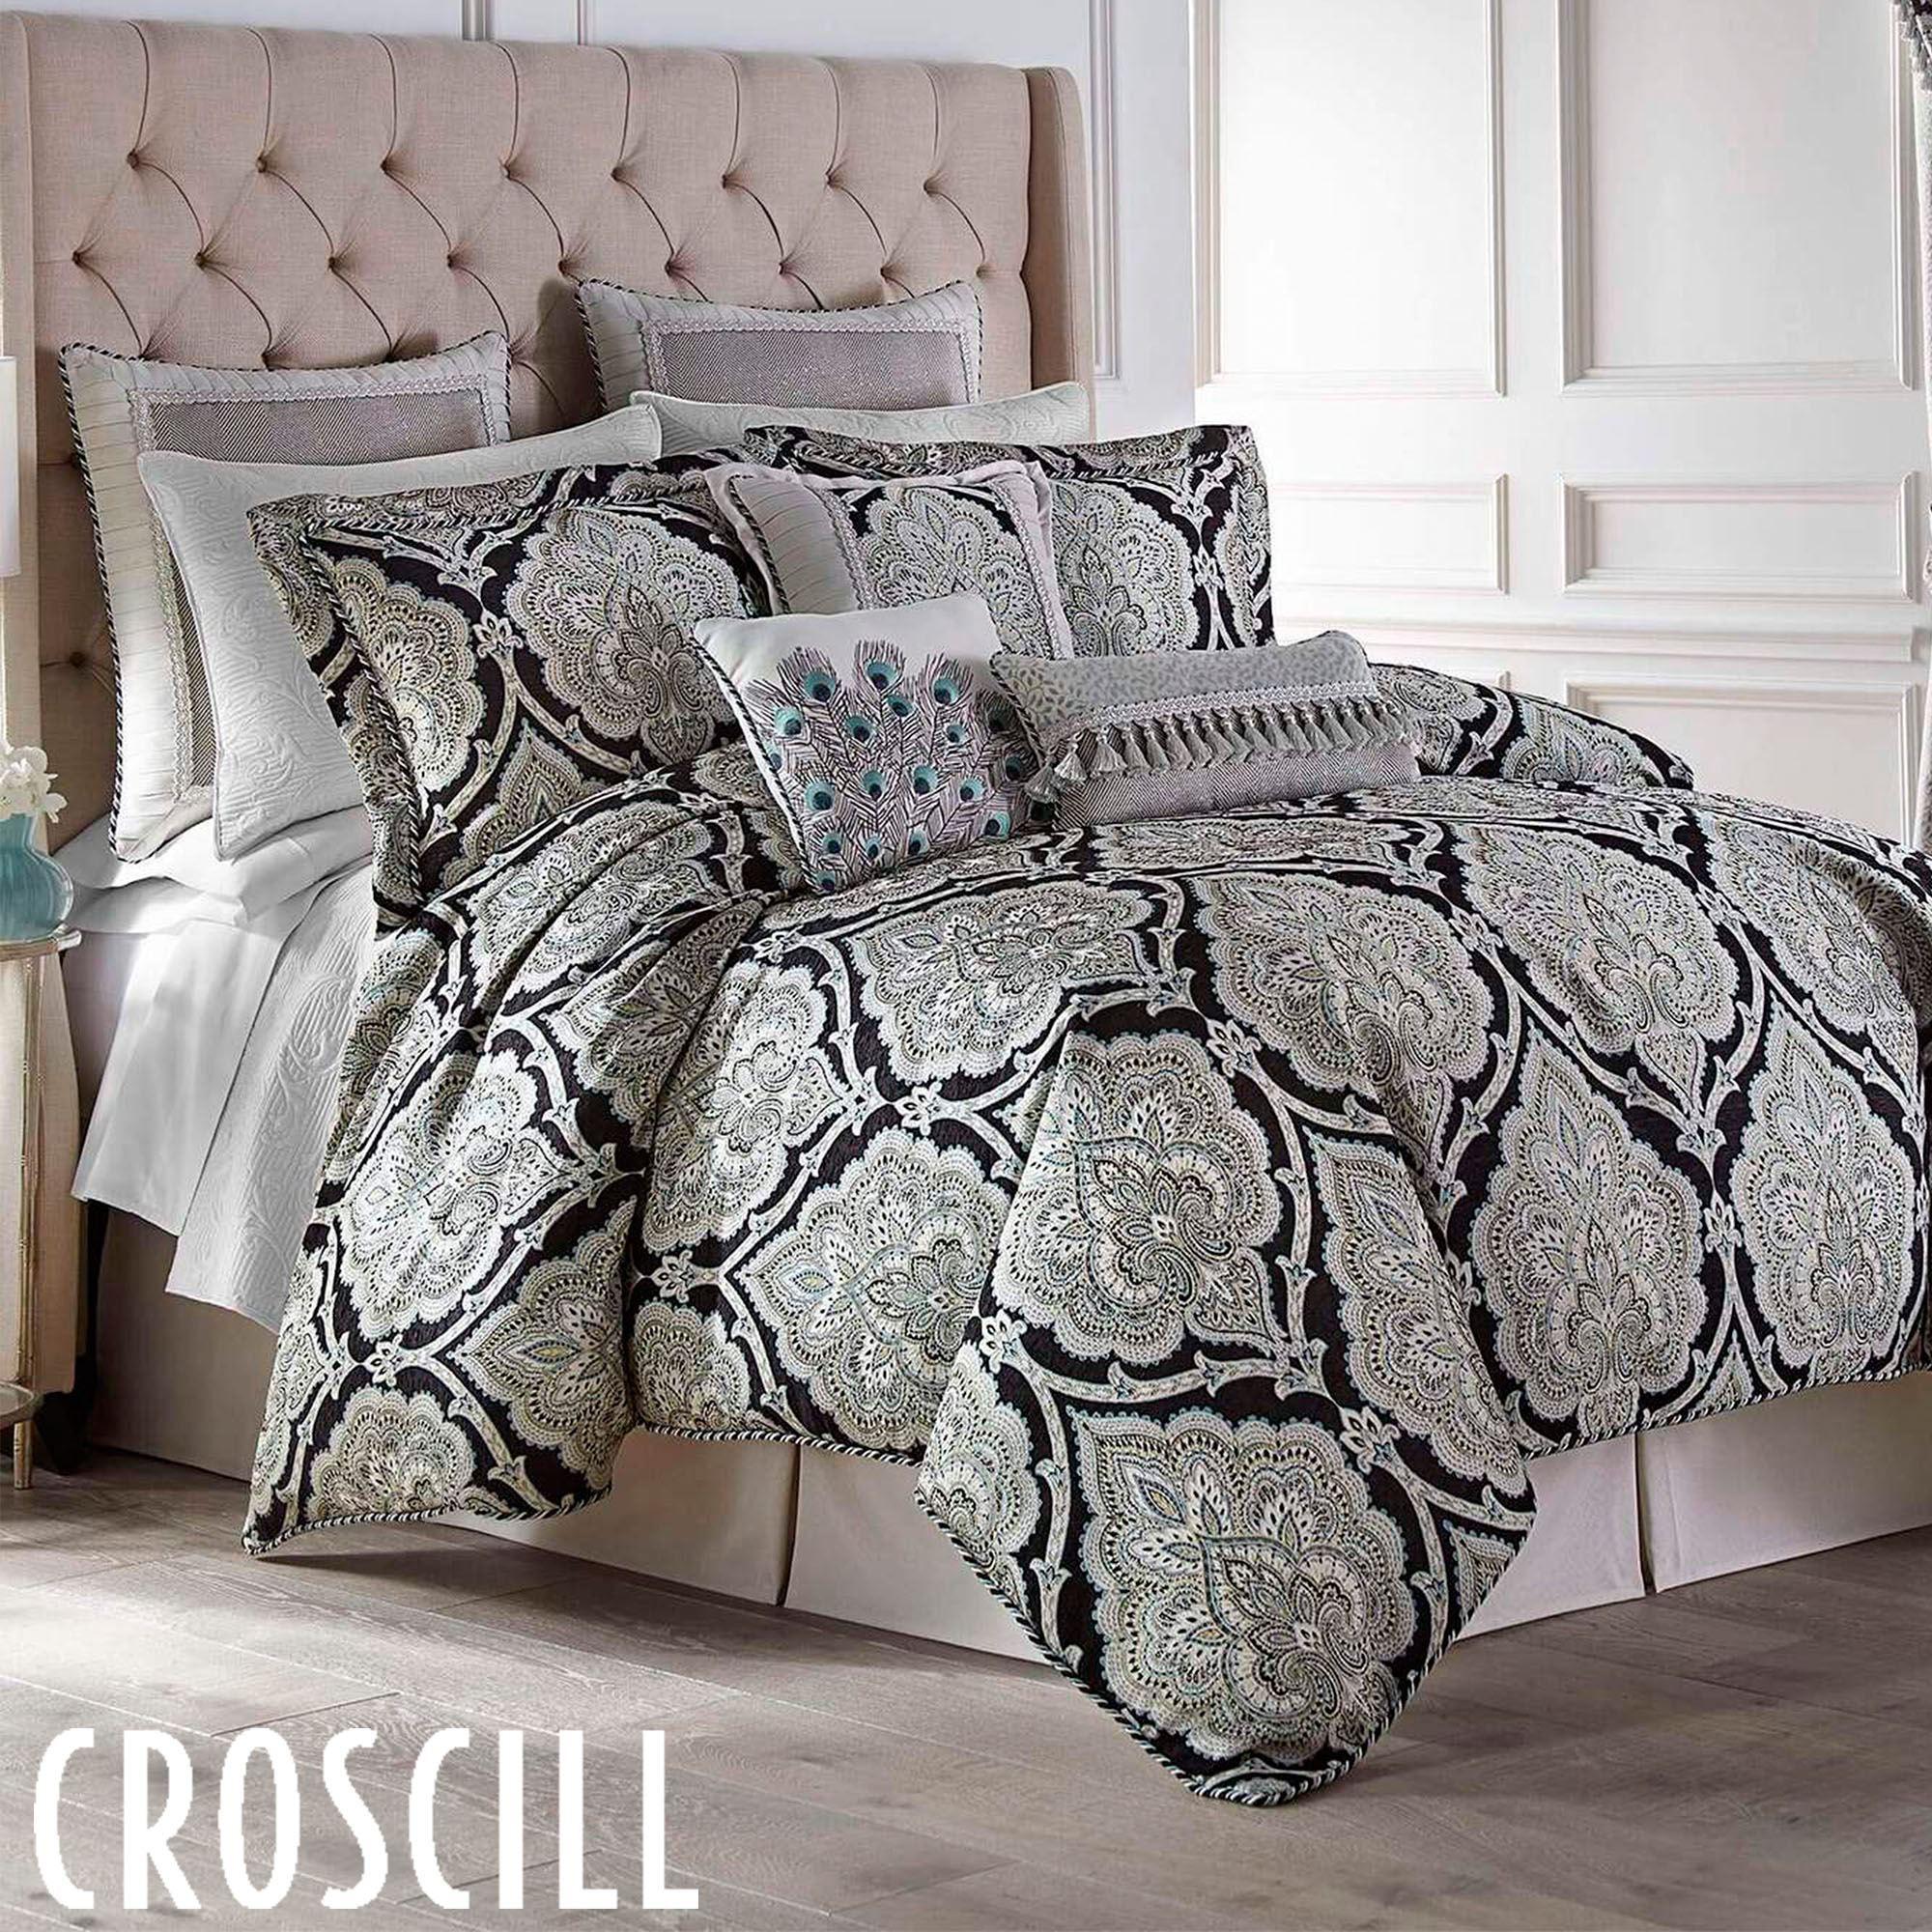 Dianella Damask Medallion Black Comforter Set Bedding From Croscill